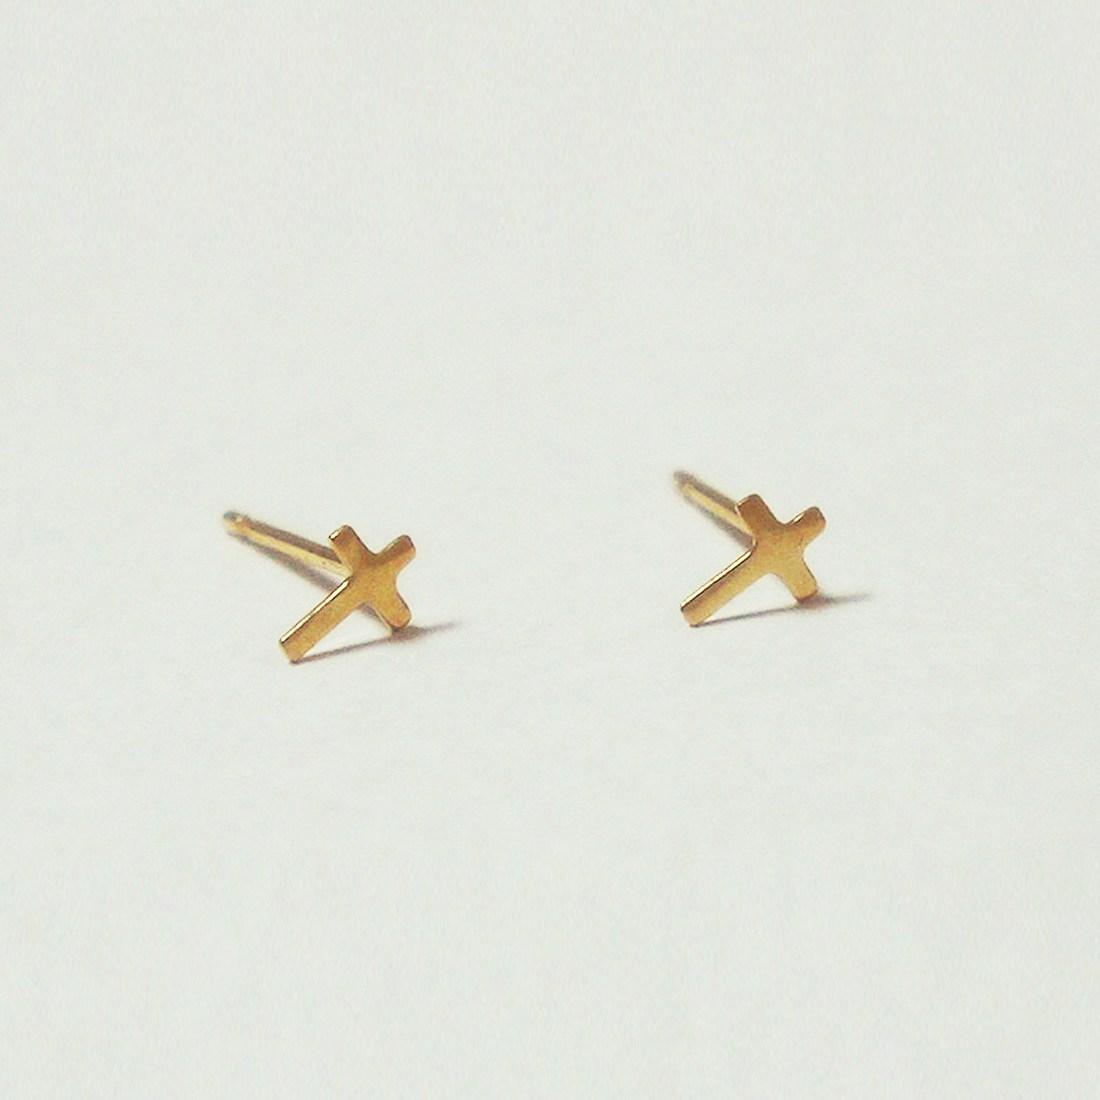 merryG 메리지 10K 골드 십자가 귀걸이